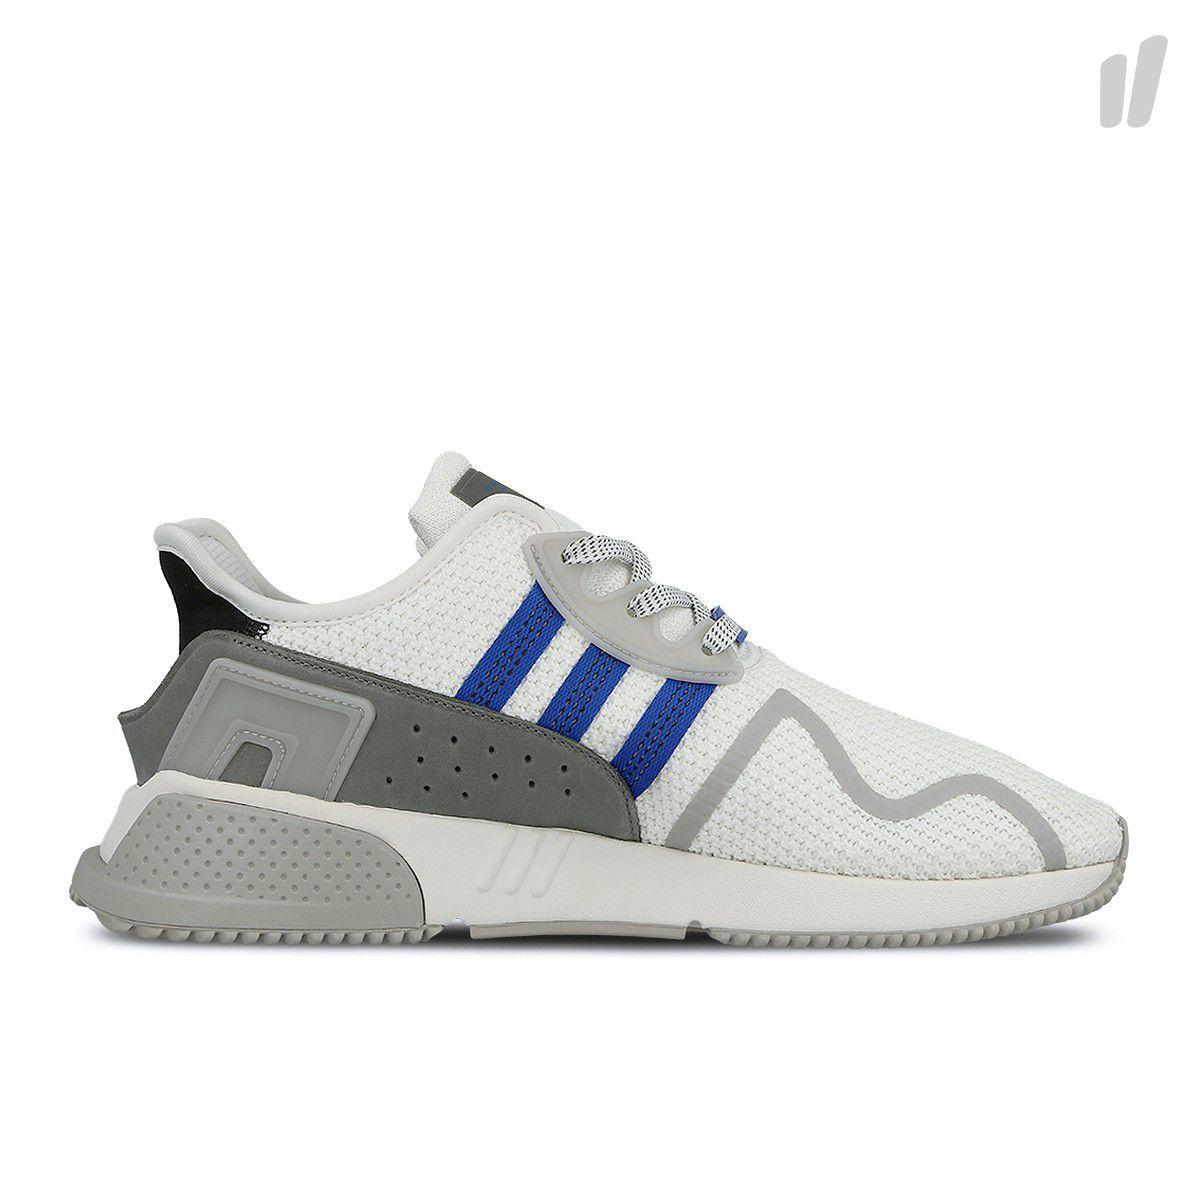 promo code 4d735 8e651 Adidas ORIGINALS EQT CUSHION ADV Sneakers White Casual Shoes